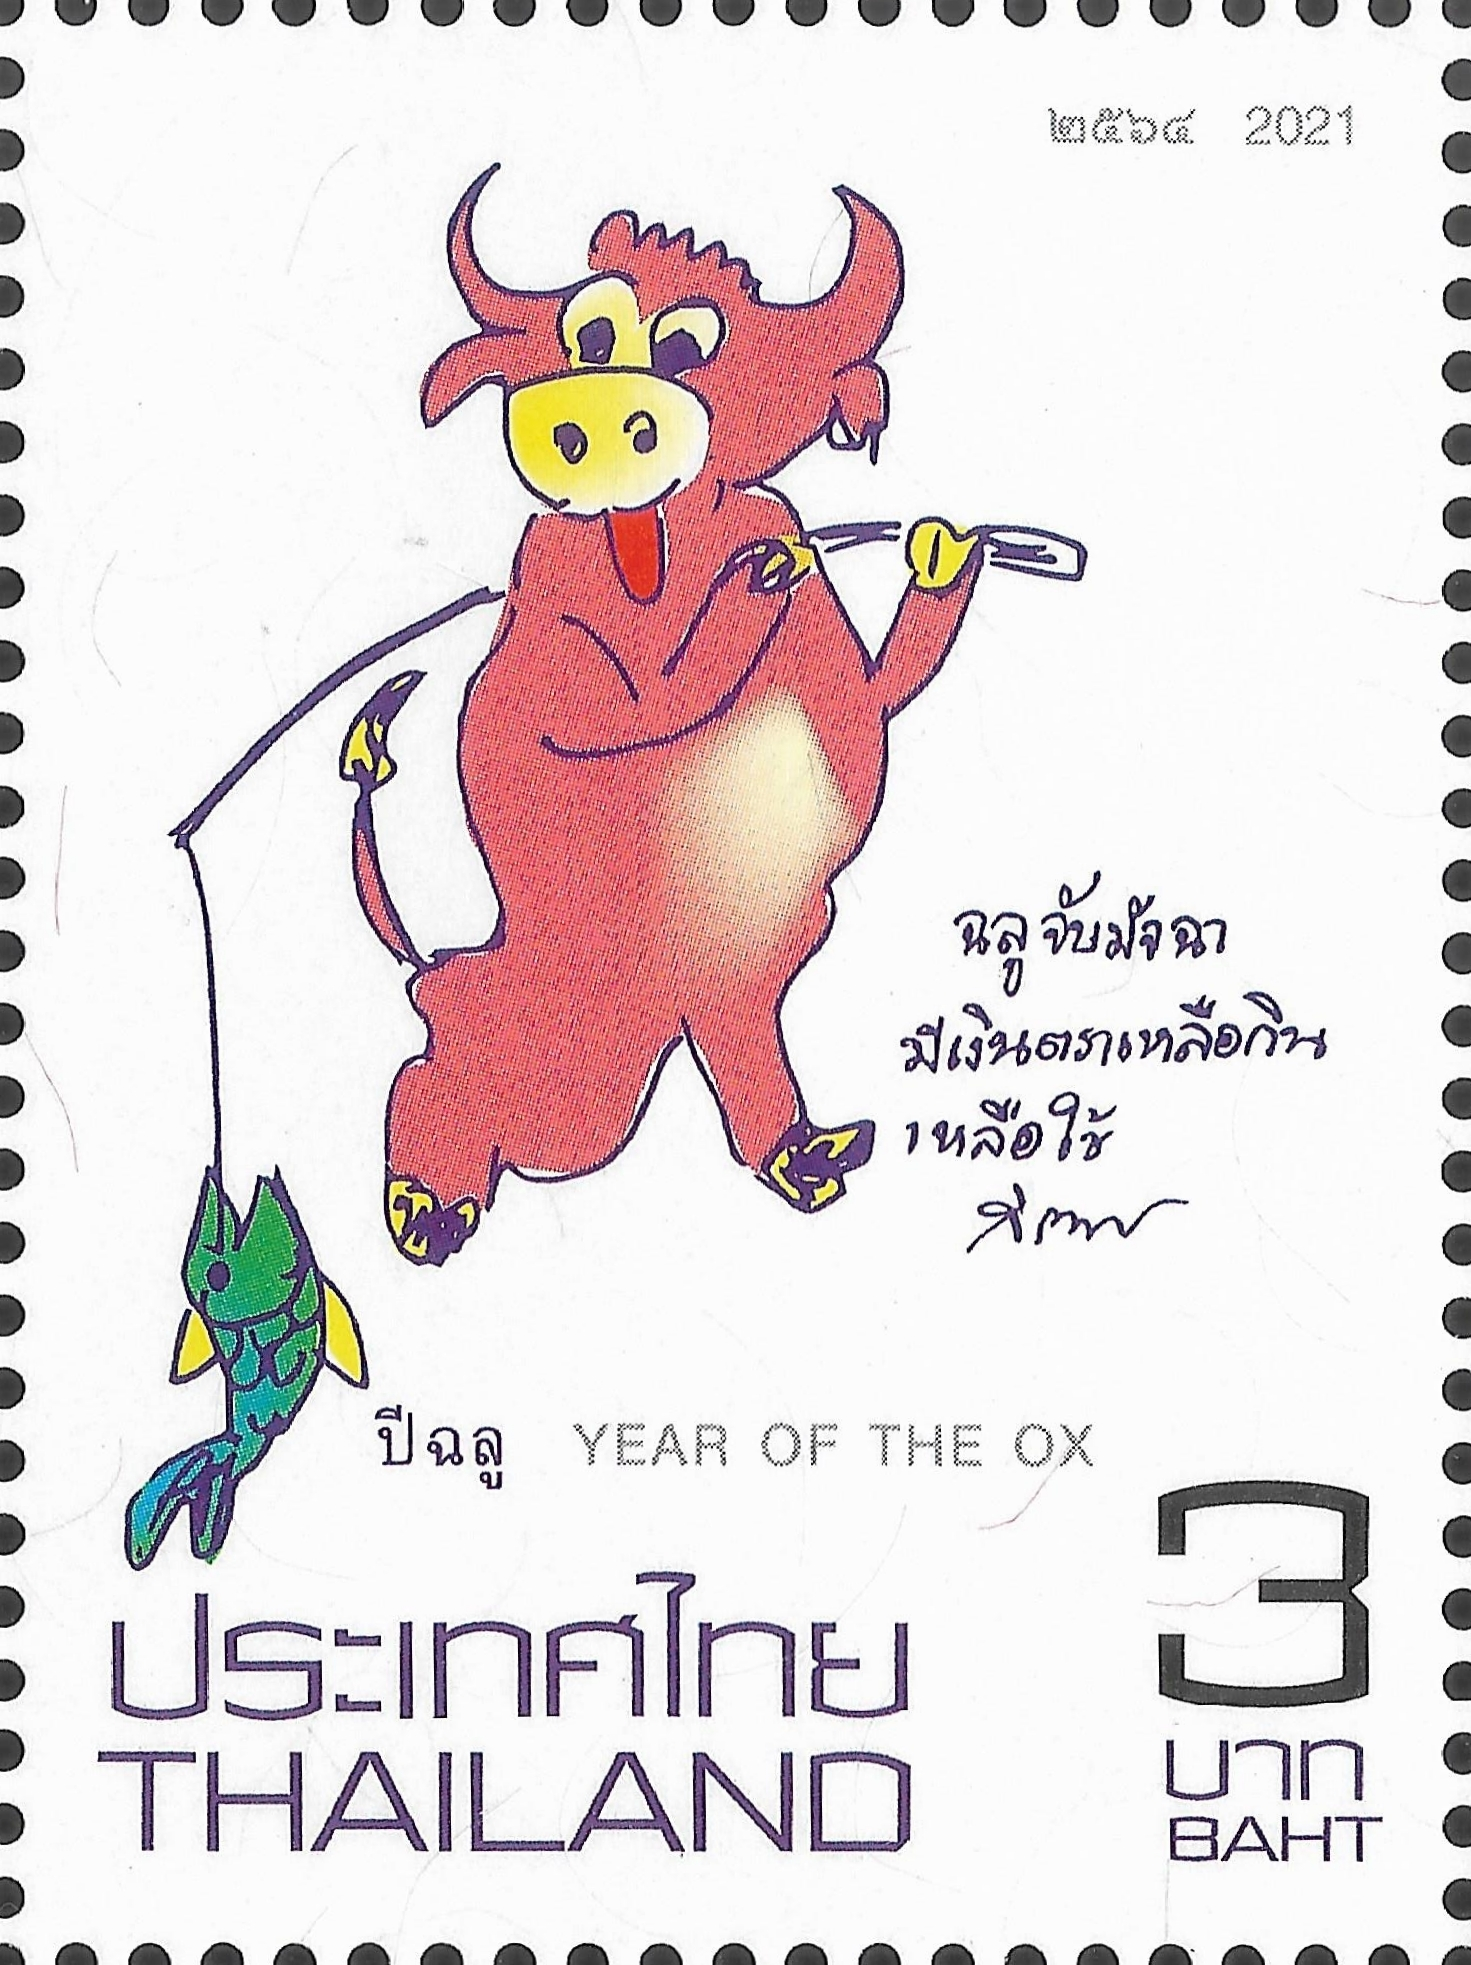 Thailand: Year of the Ox, 4 January 2021 [1200dpi scan by Mark Joseph Jochim]